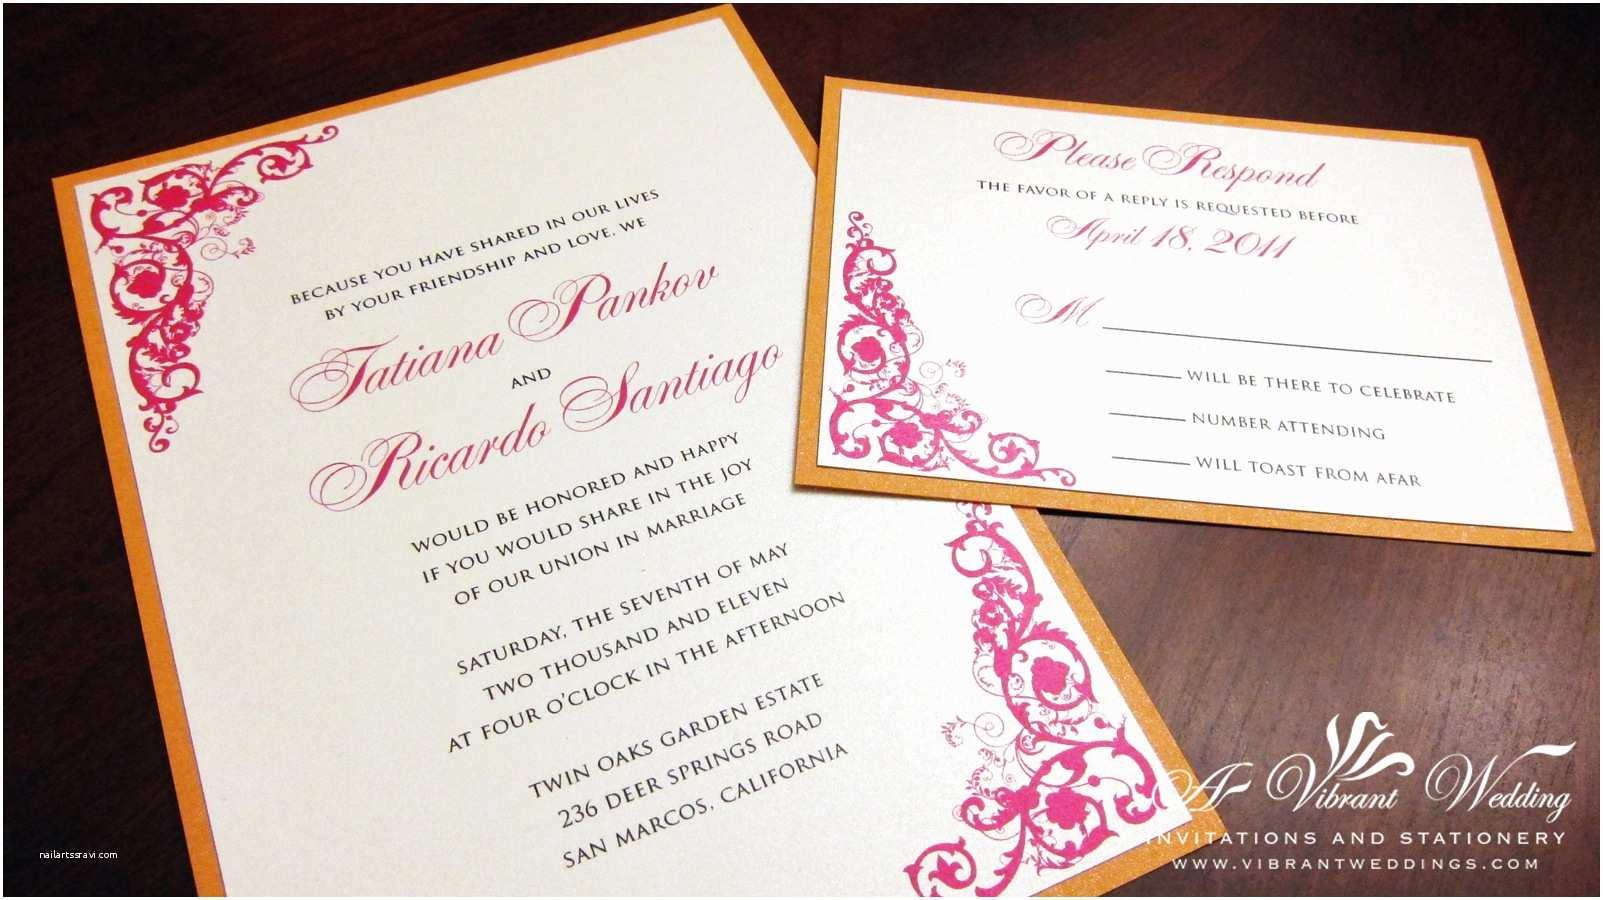 Orange Wedding Invitations Indian theme Designs – Page 2 – A Vibrant Wedding